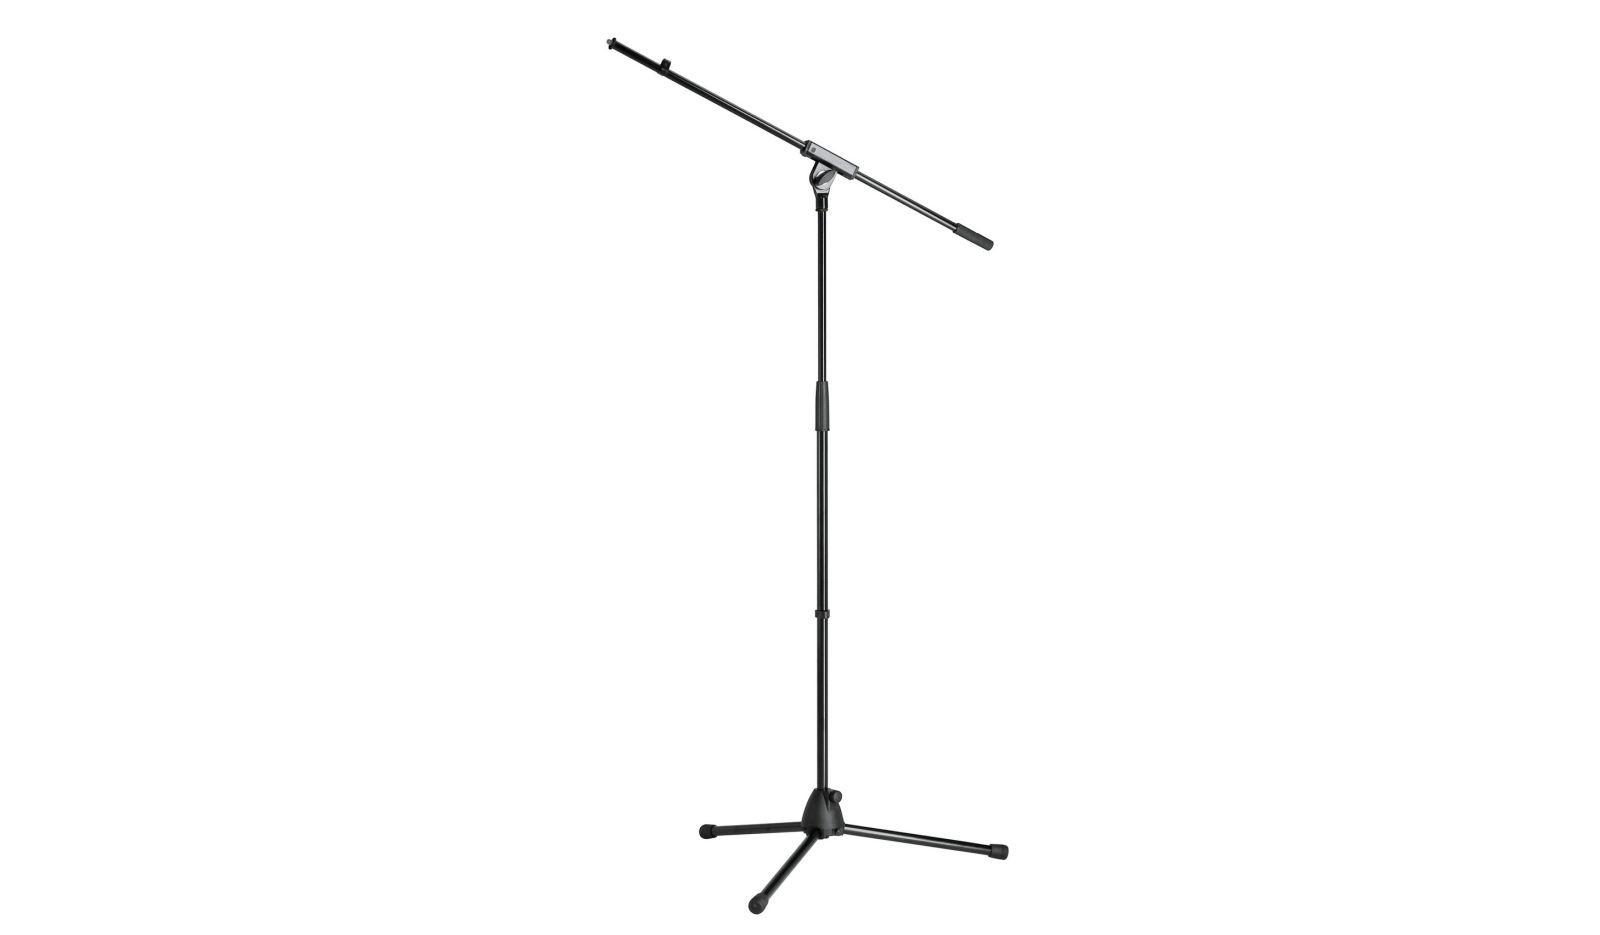 K&M 27105-300-55 Mikrofonstativ